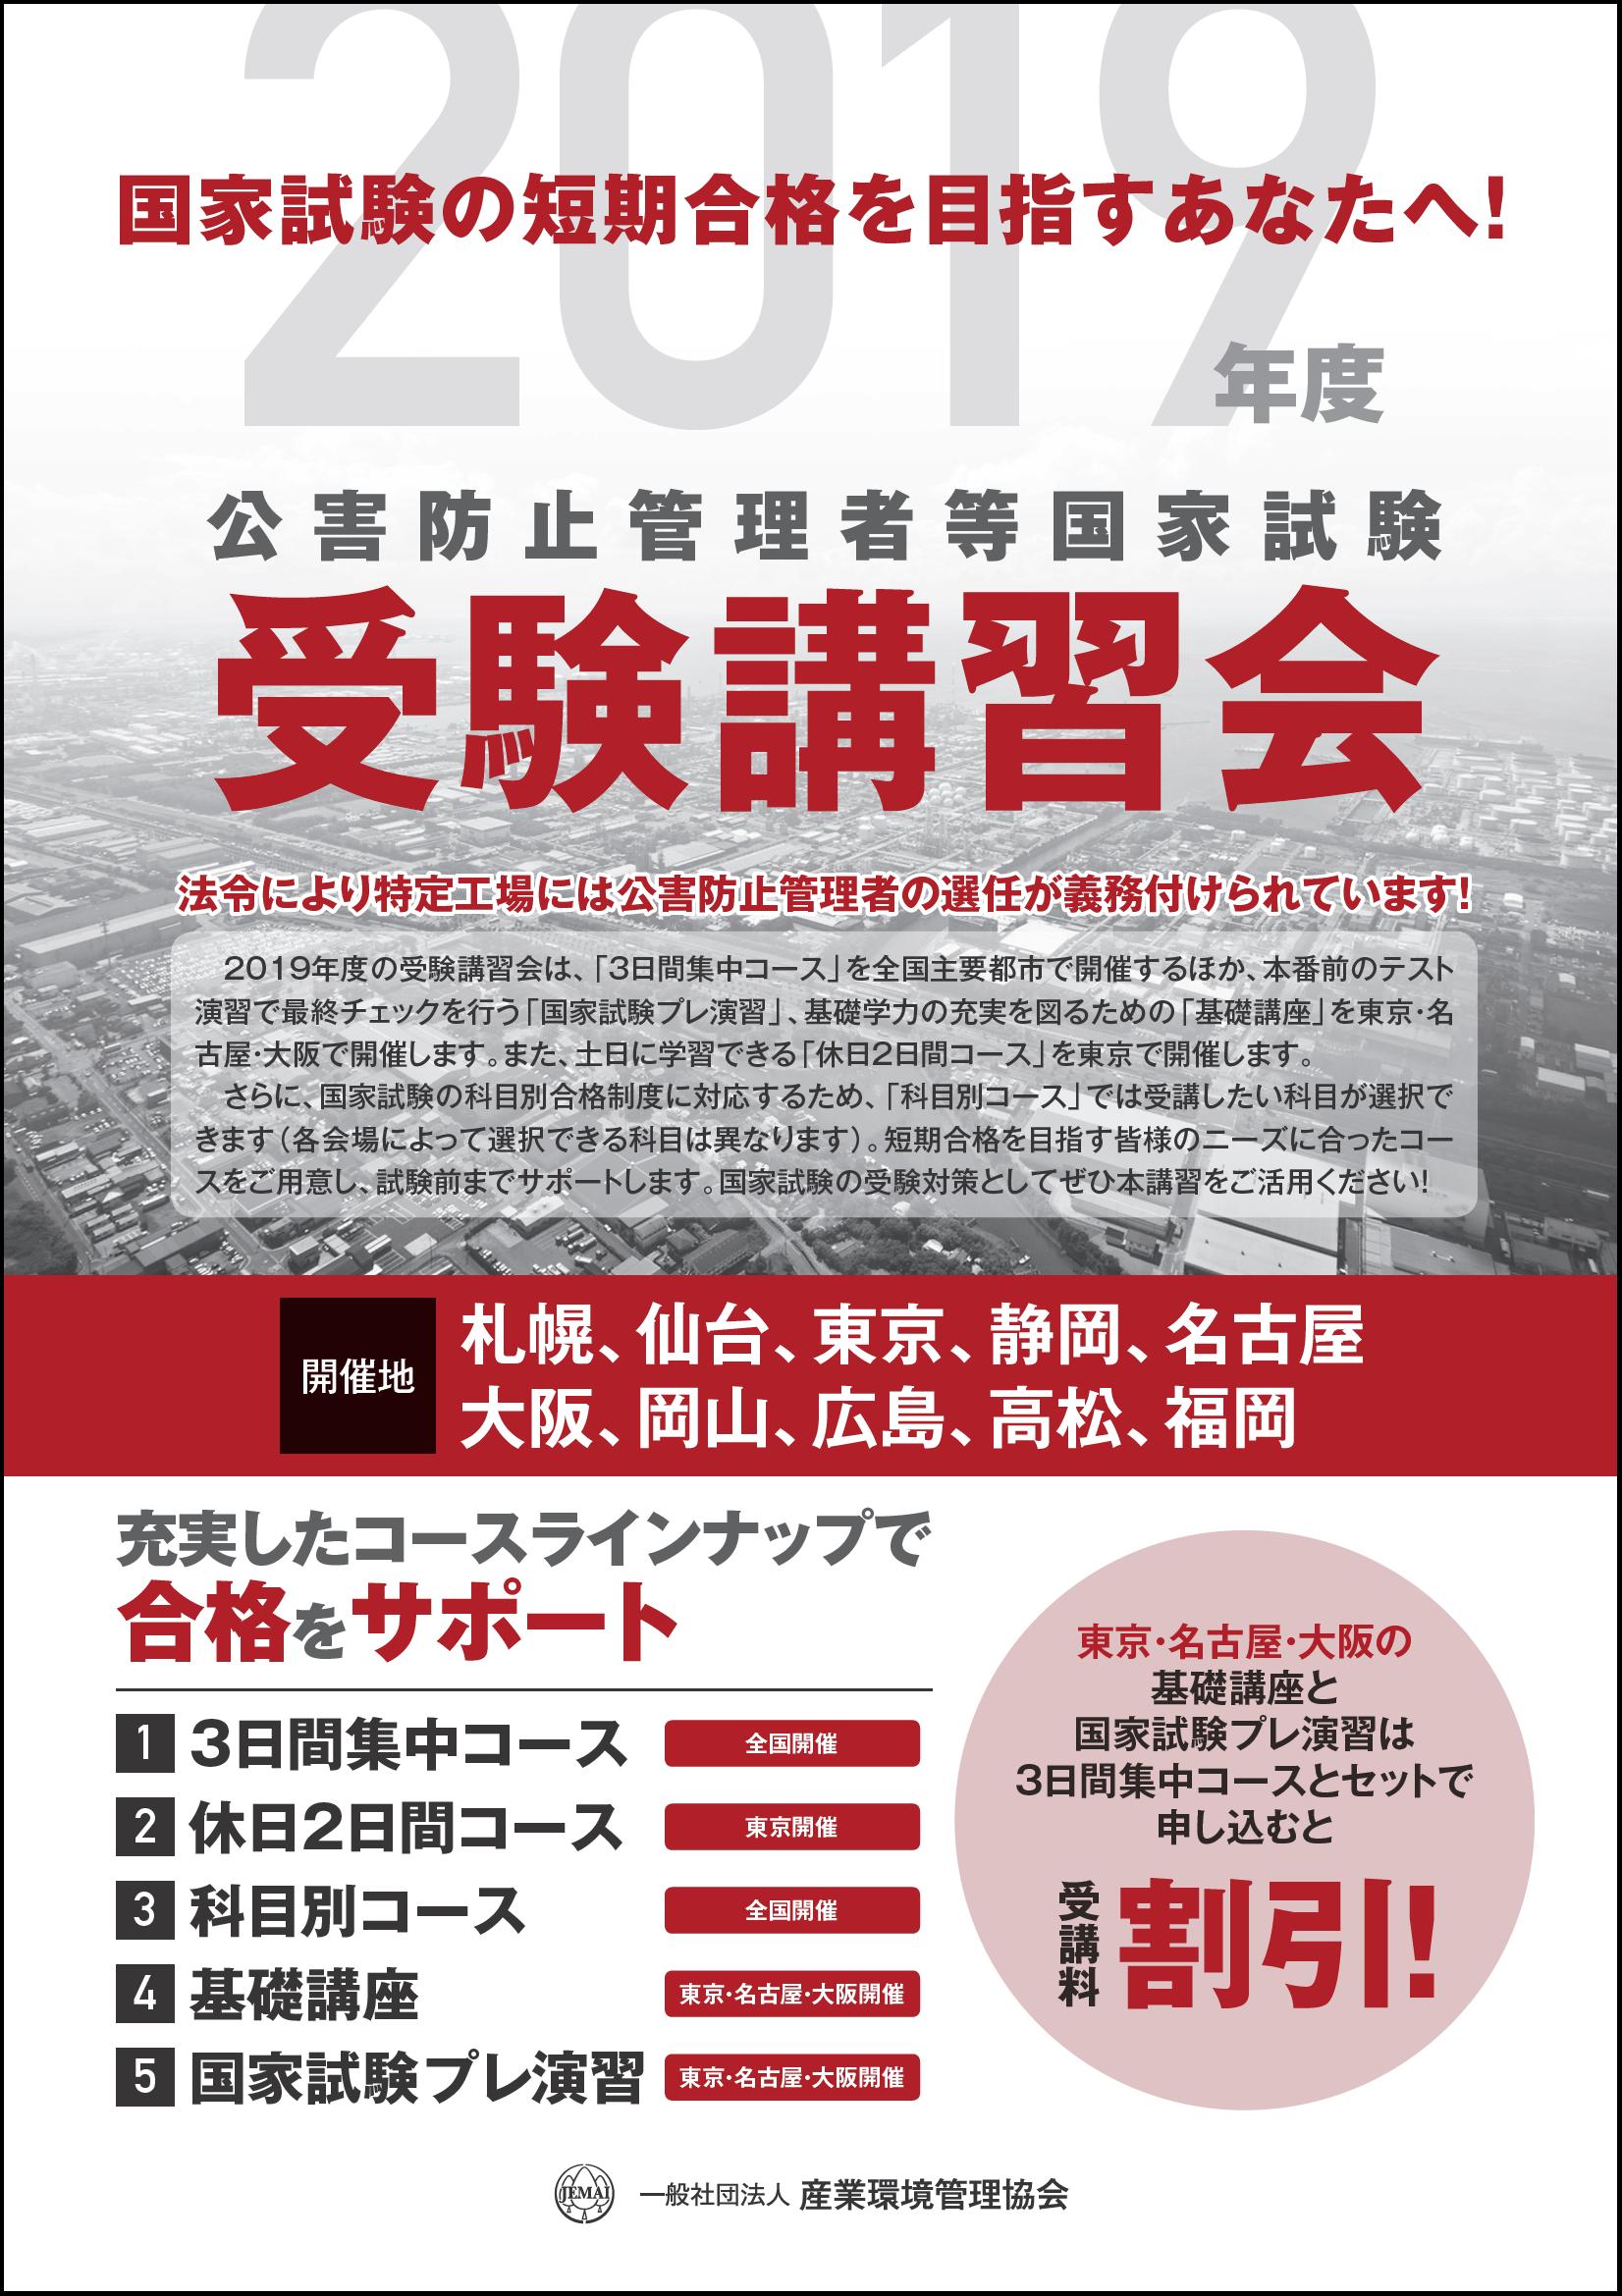 koushu_pamphlet2019_p1.png